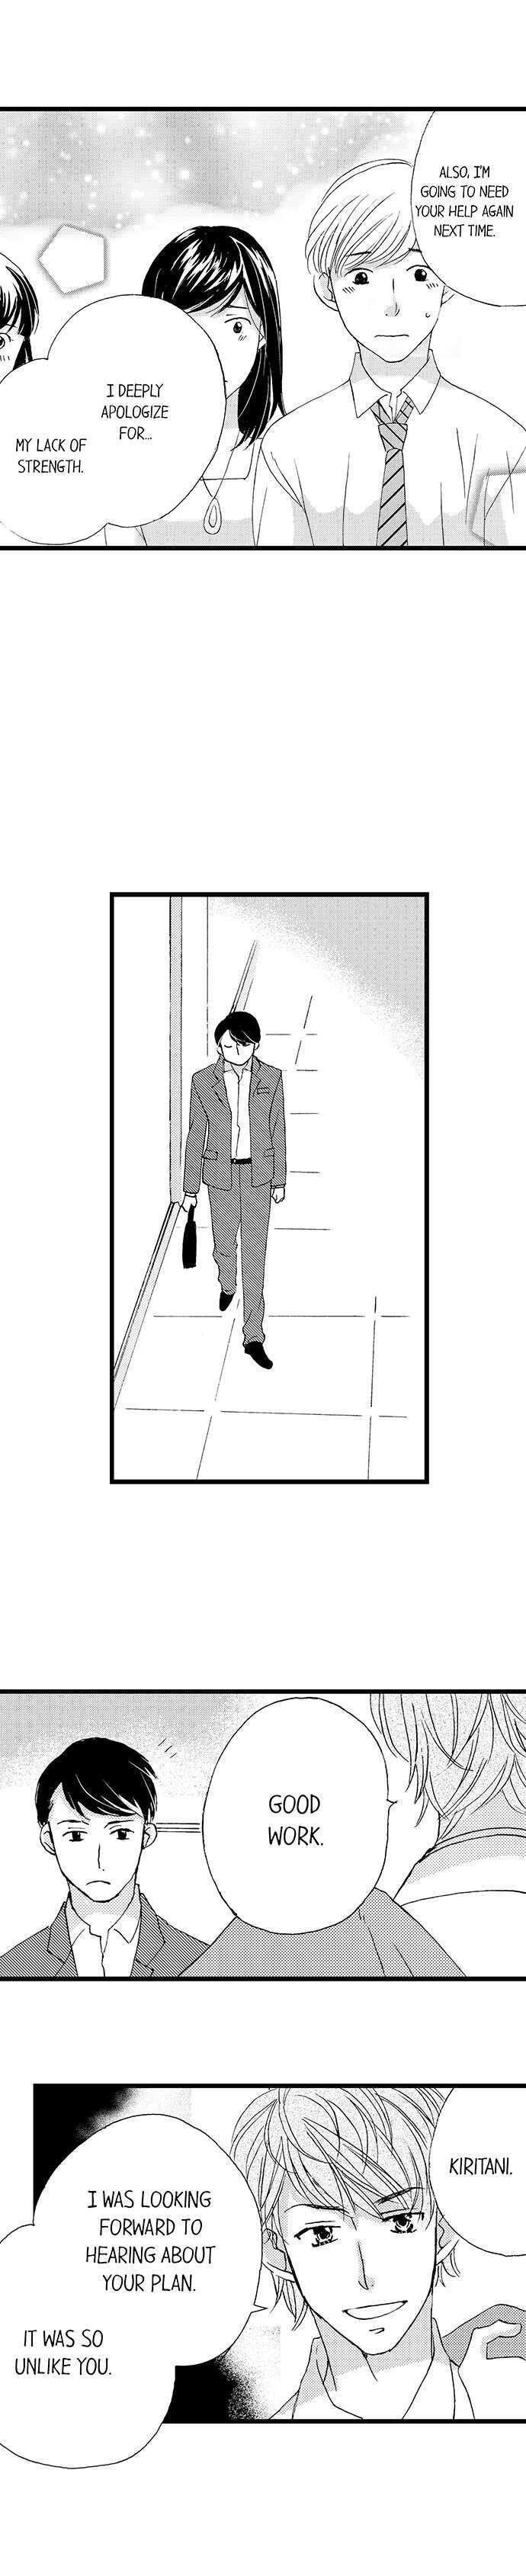 Amaku Nureru Uso Kekkon Toiu Na No Fukushu Chapter 64 page 12 - Mangakakalots.com